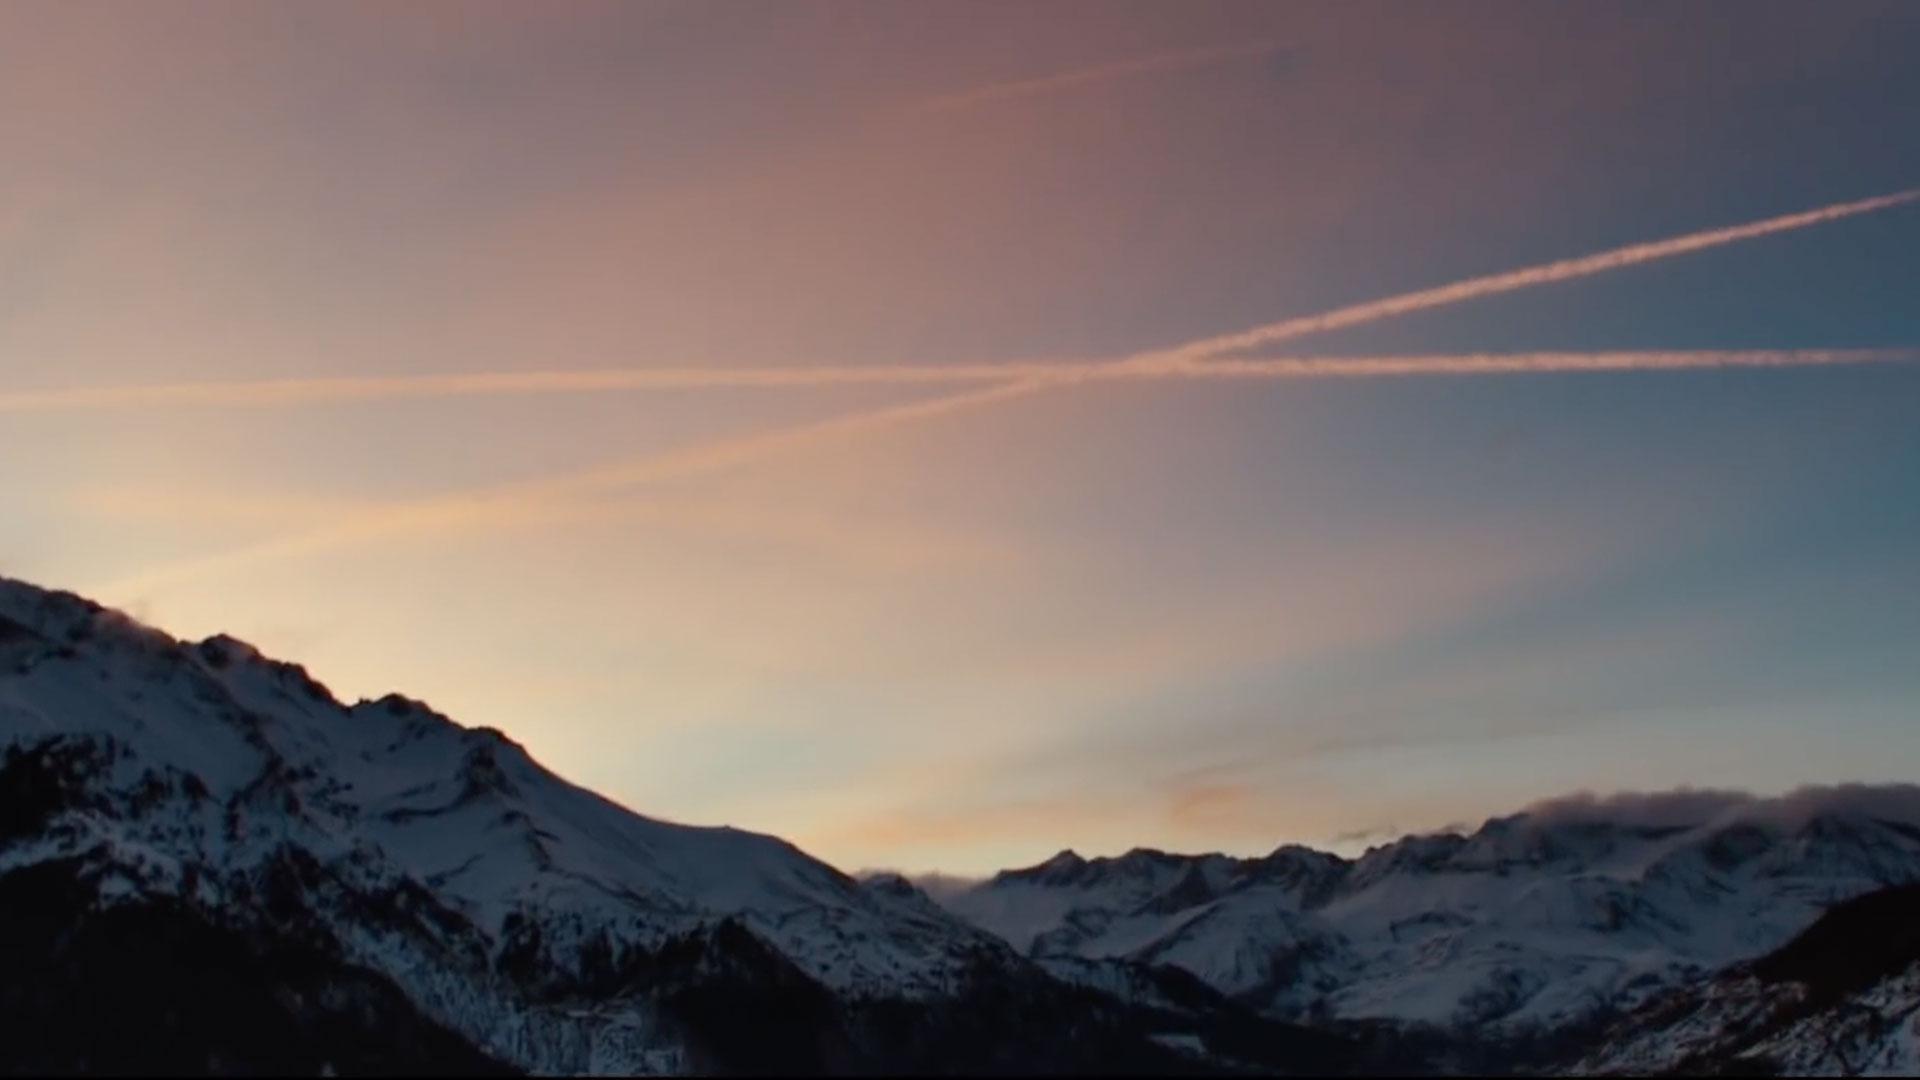 sky mountain outdoor snow cloud landscape nature sunrise sunset distance highland